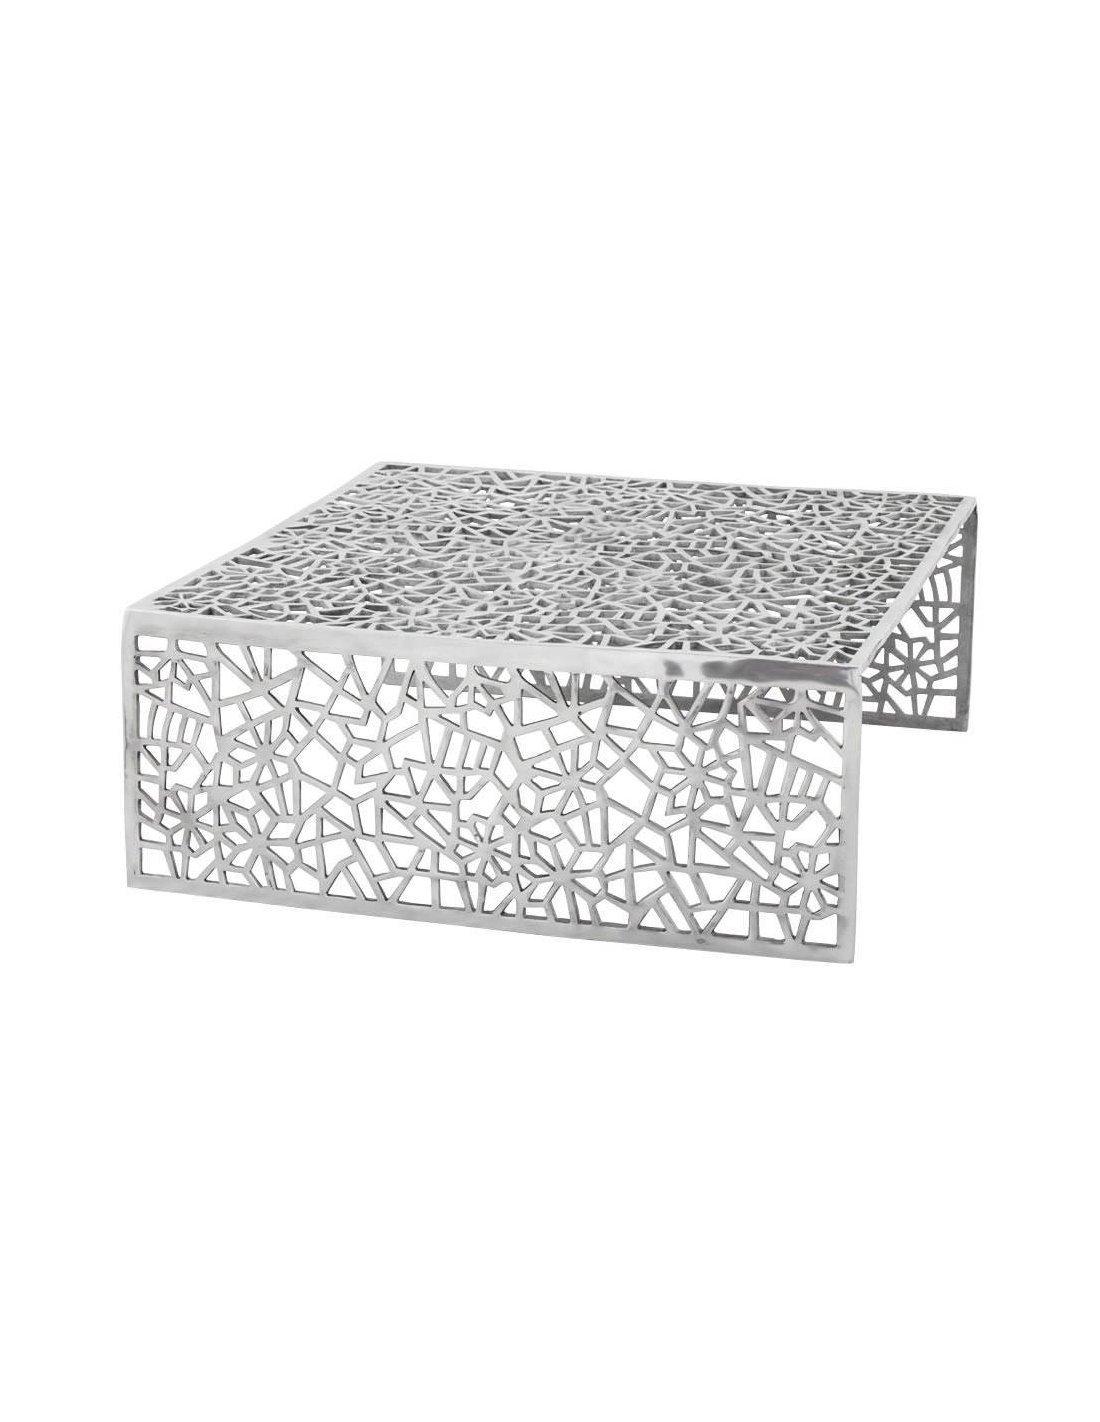 URANUSKokoon URANUSKokoon basse Table Table Table design basse design DesignArgent design DesignArgent basse srxohCtdQB